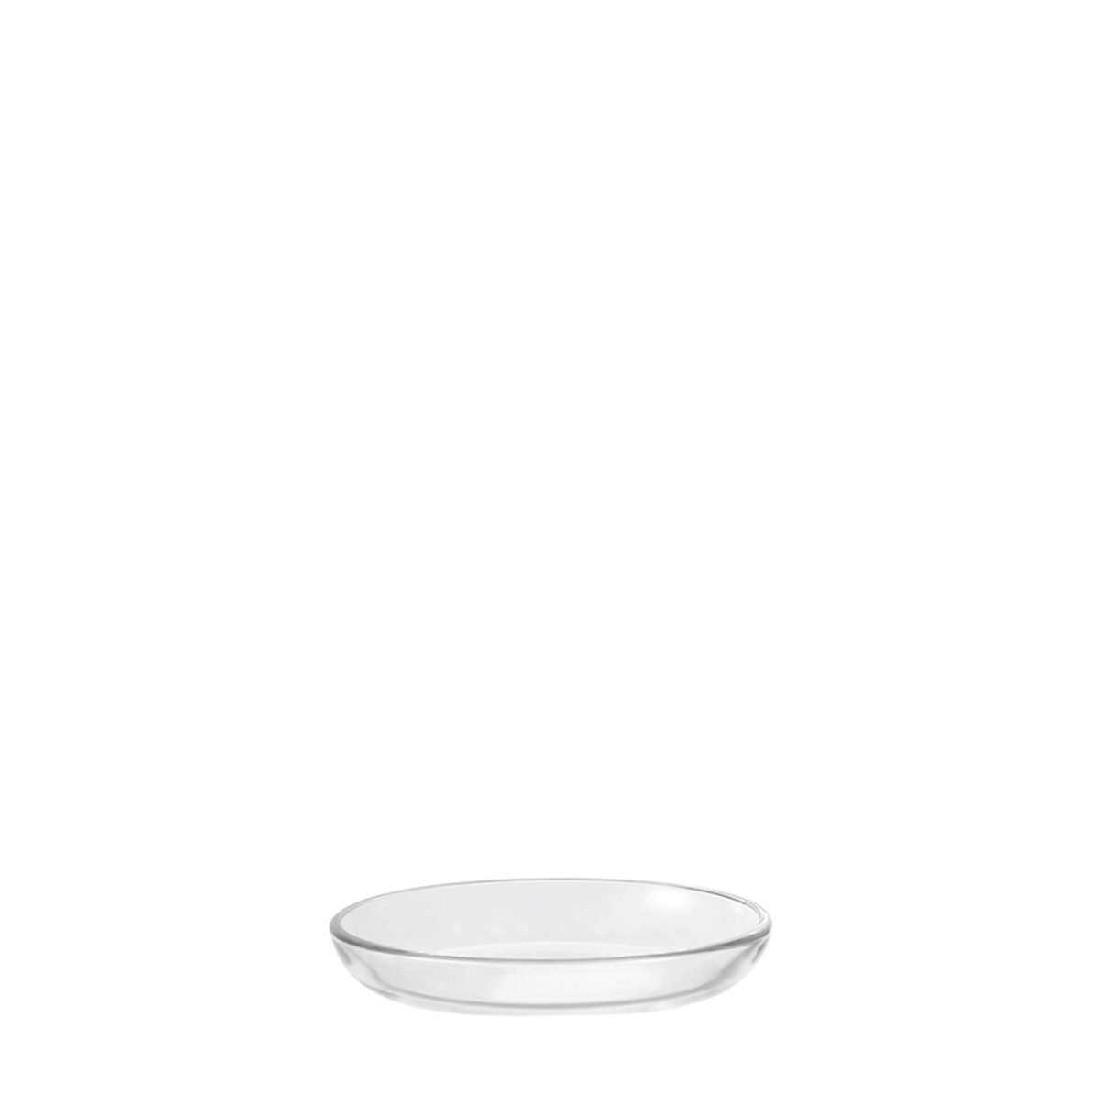 Teller Ciao (4er-Set) – 17 cm, Leonardo kaufen